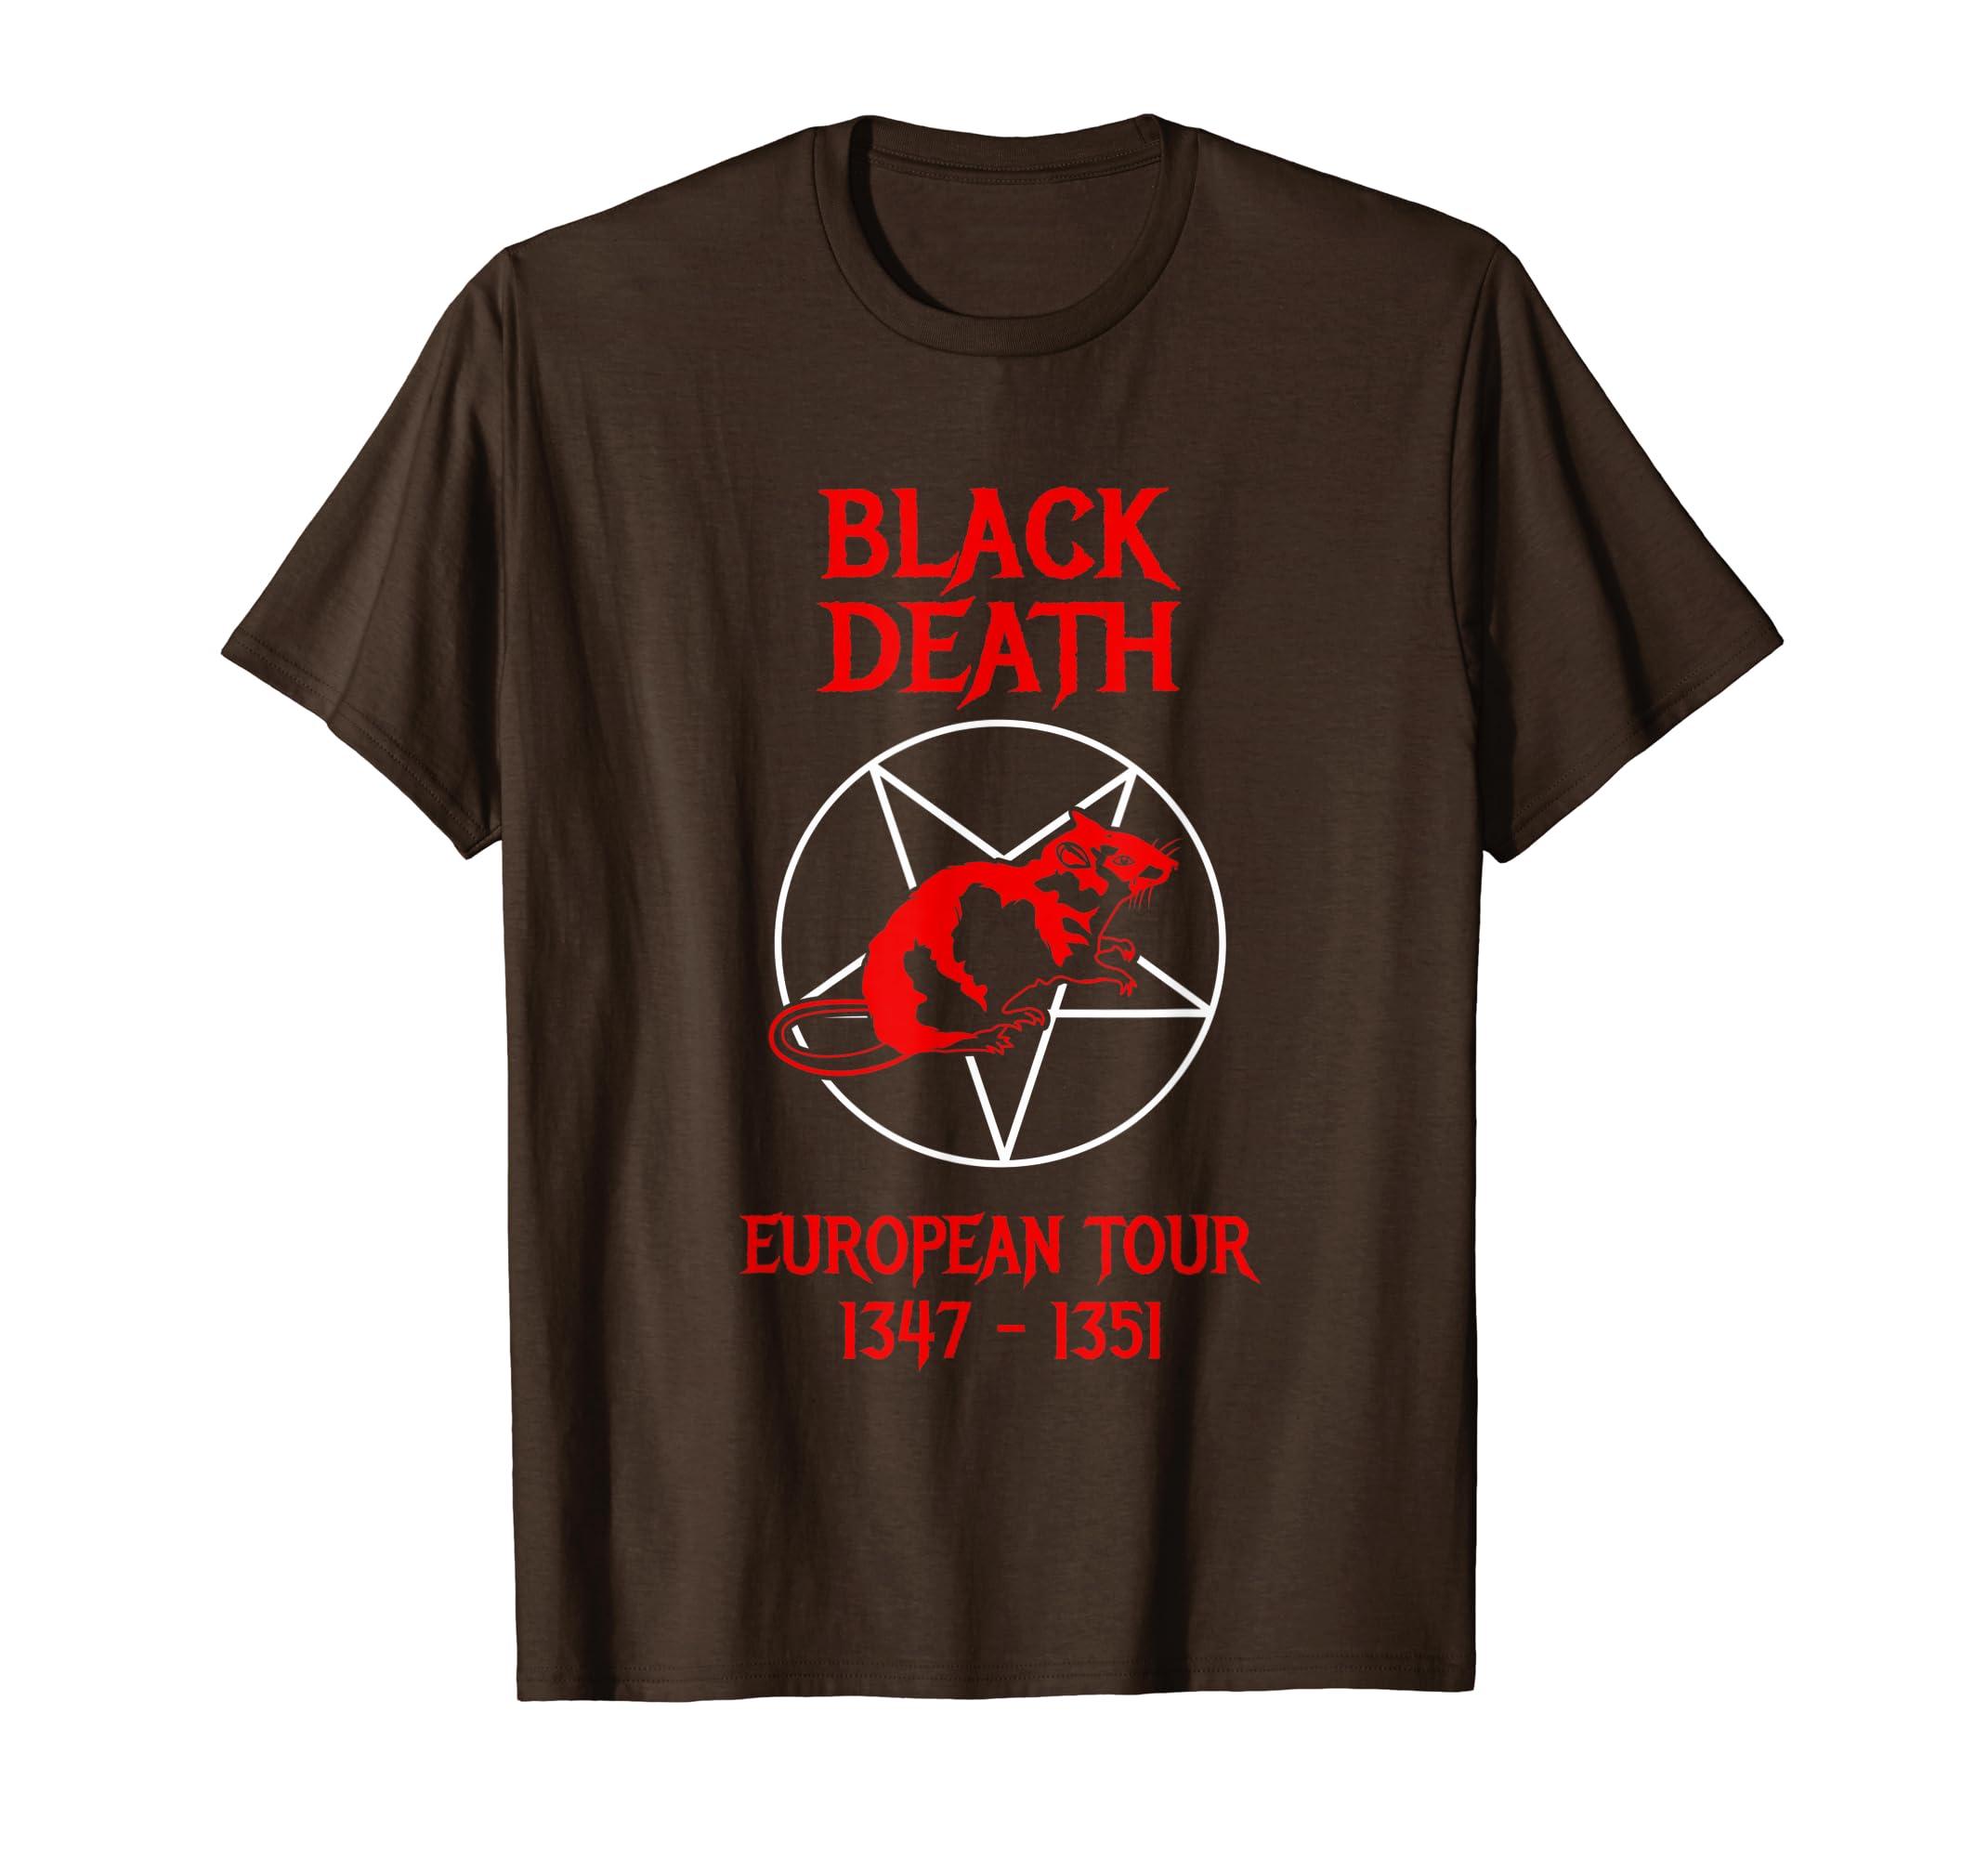 Black Death European Tour T-Shirt – Funny History-Loveshirt